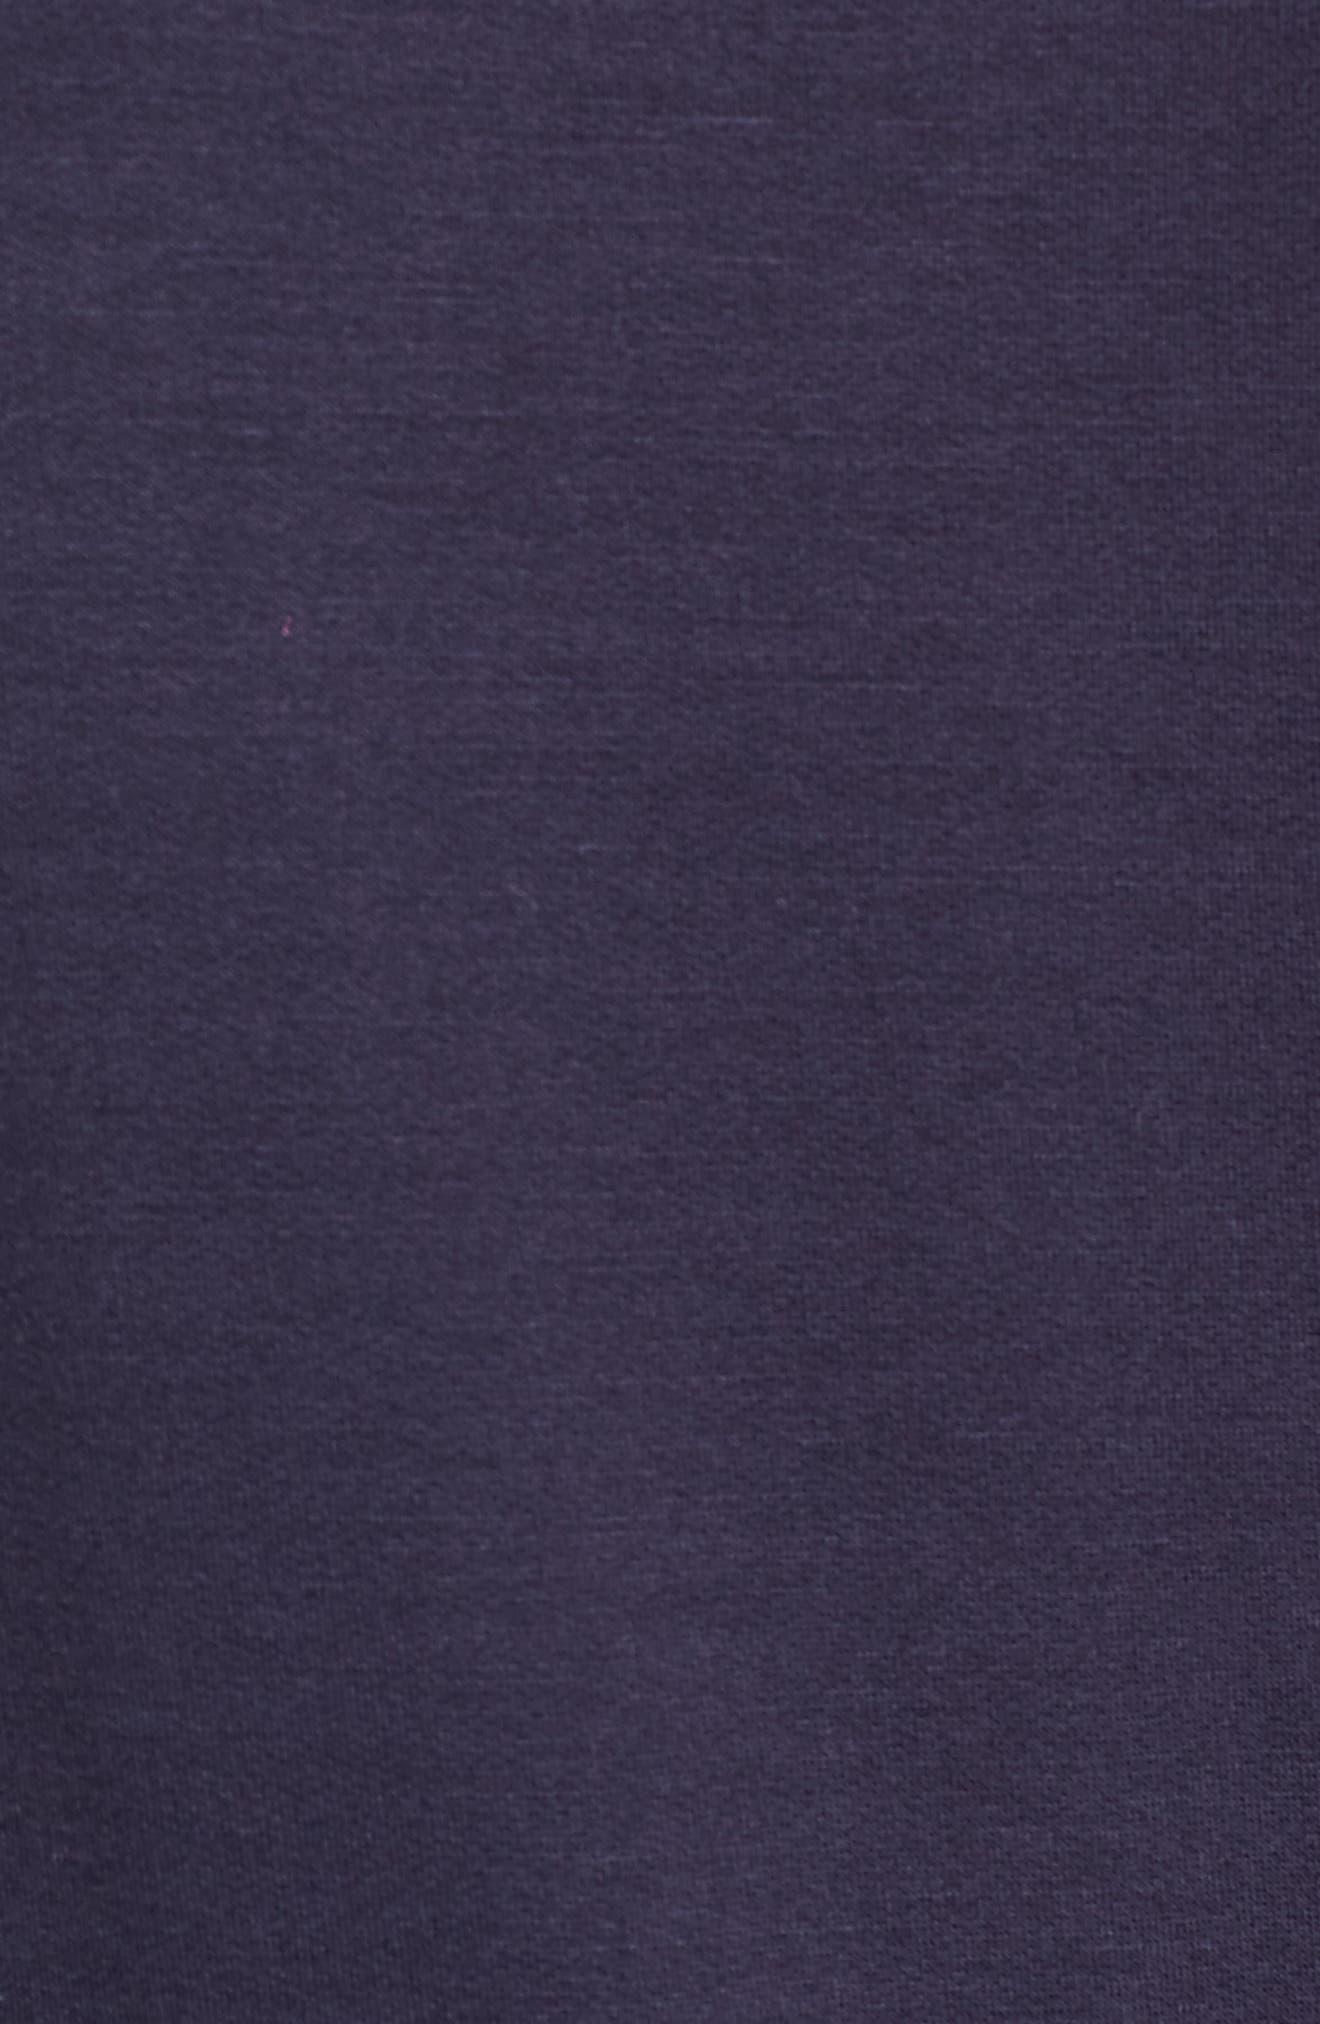 Lace Sleeve Sweatshirt,                             Alternate thumbnail 19, color,